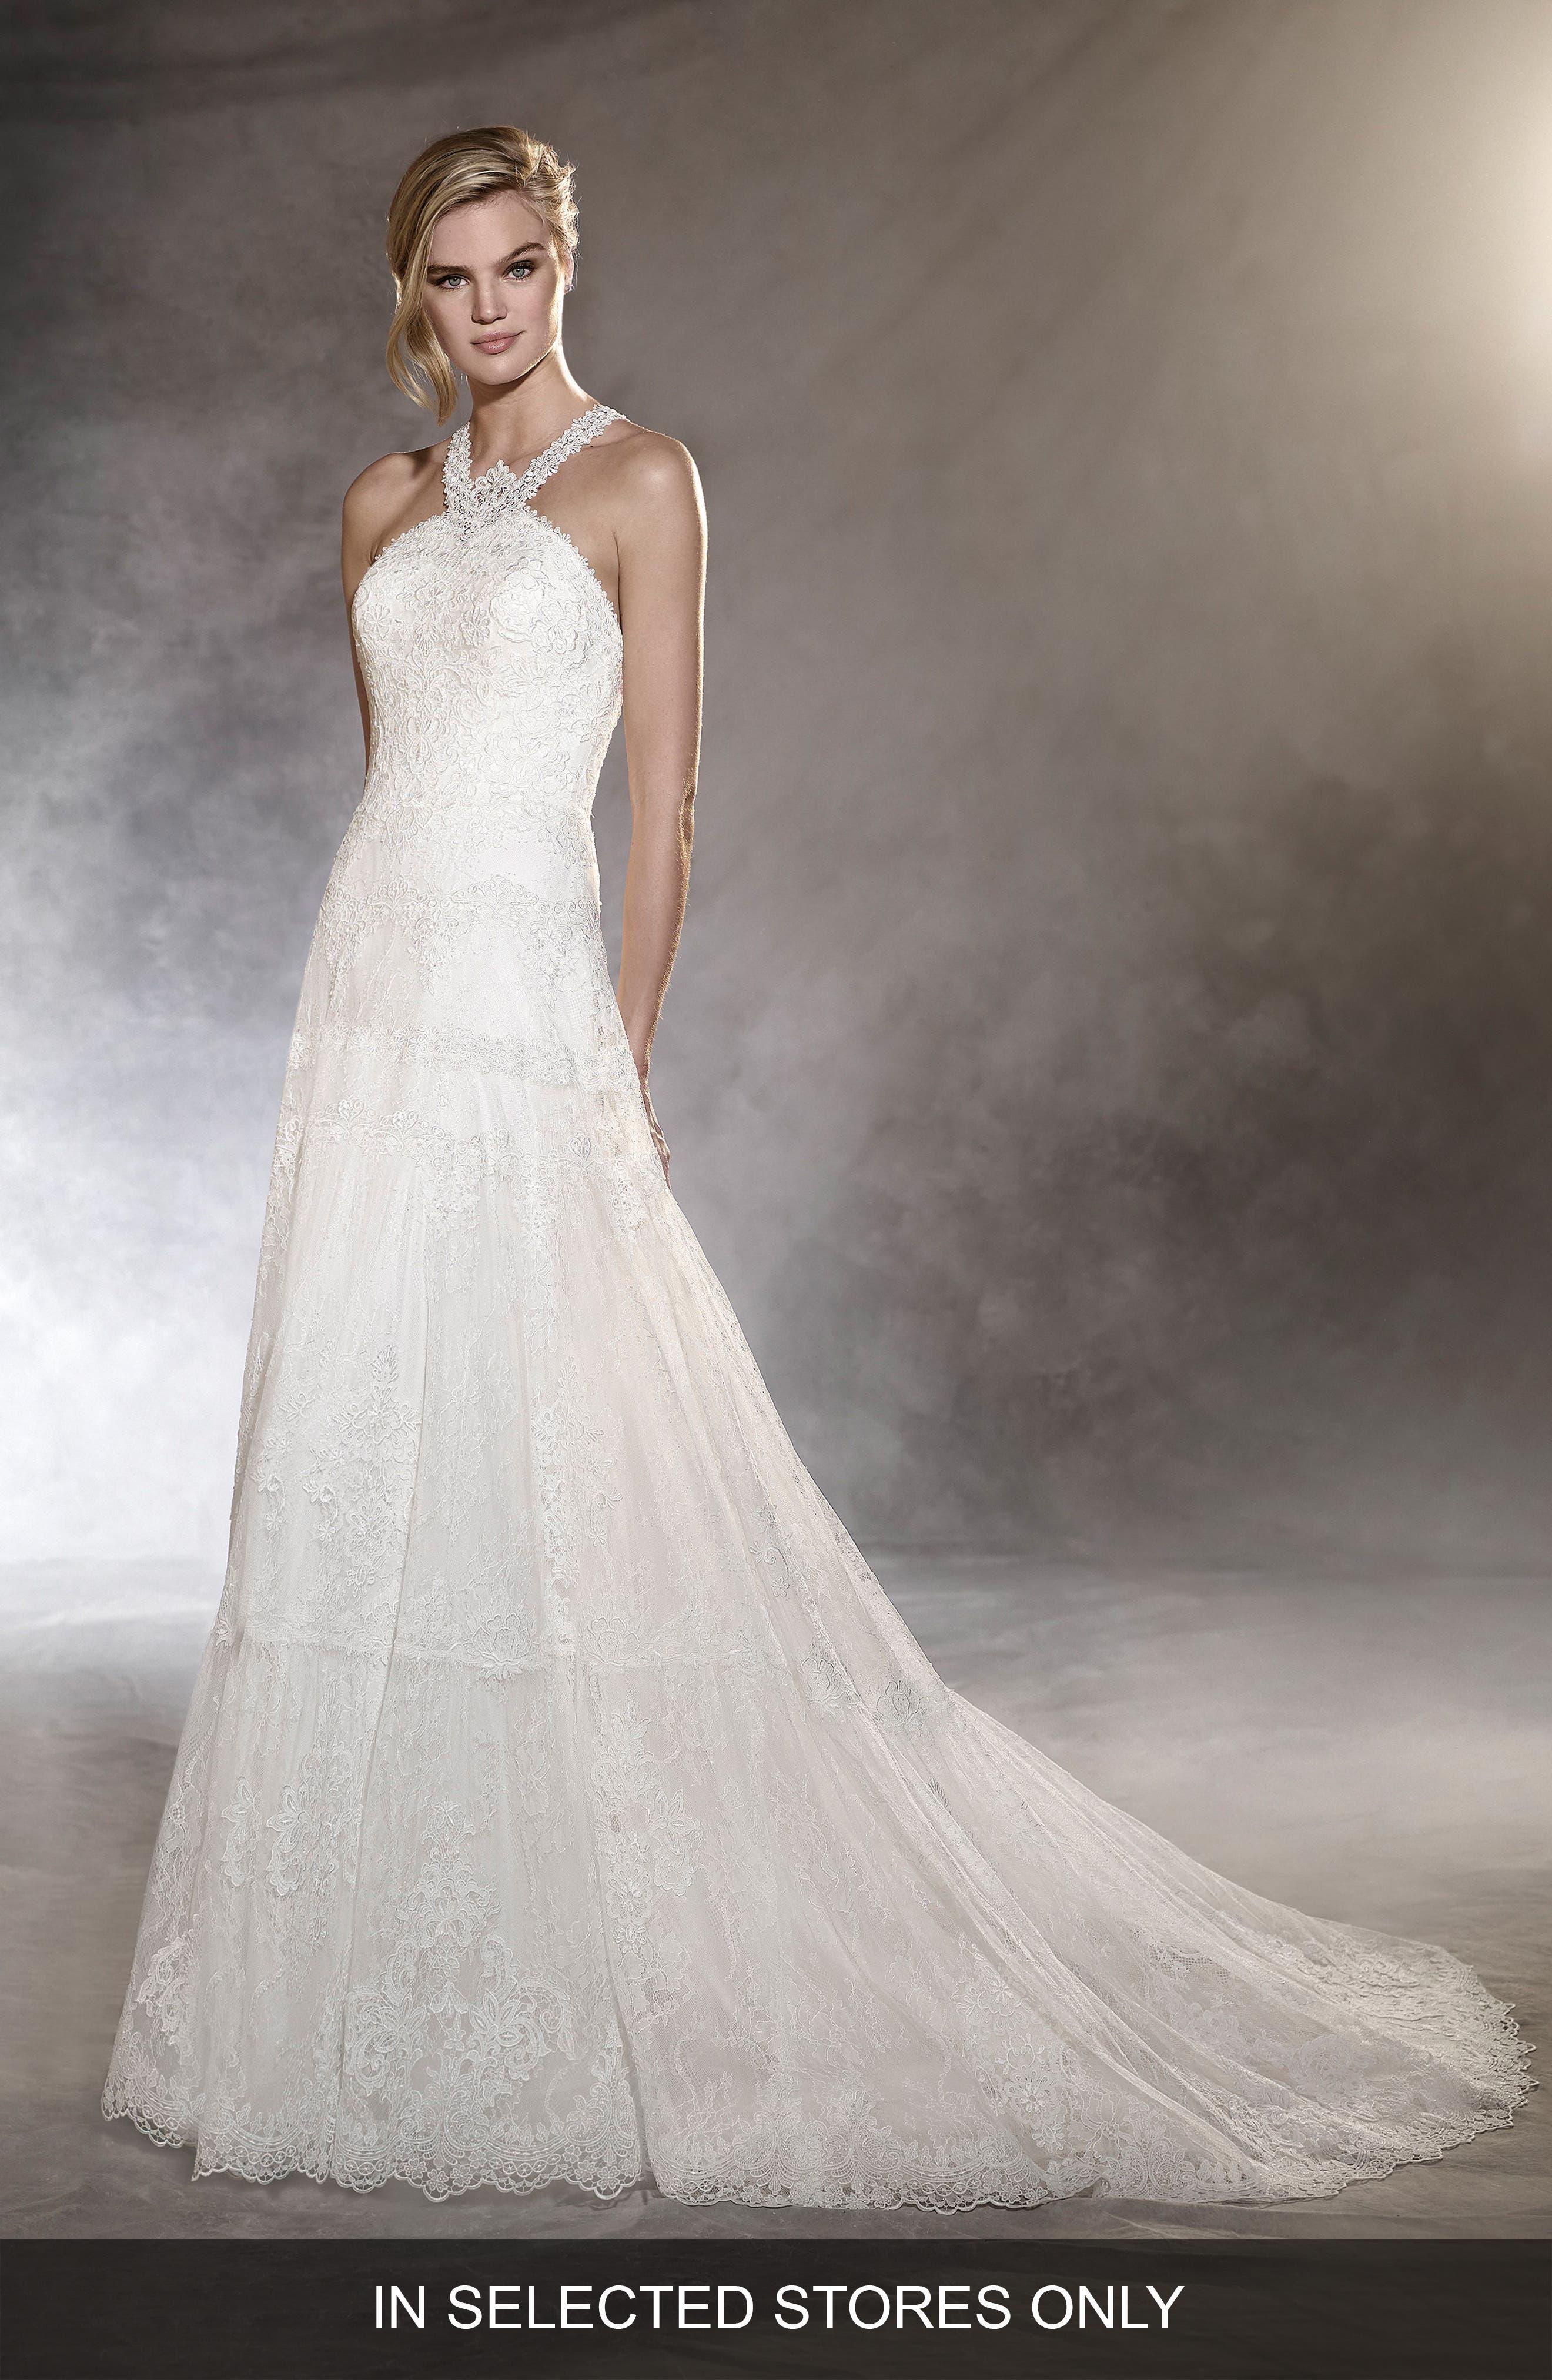 Alternate Image 1 Selected - Pronovias Ospel Halter Lace Gown